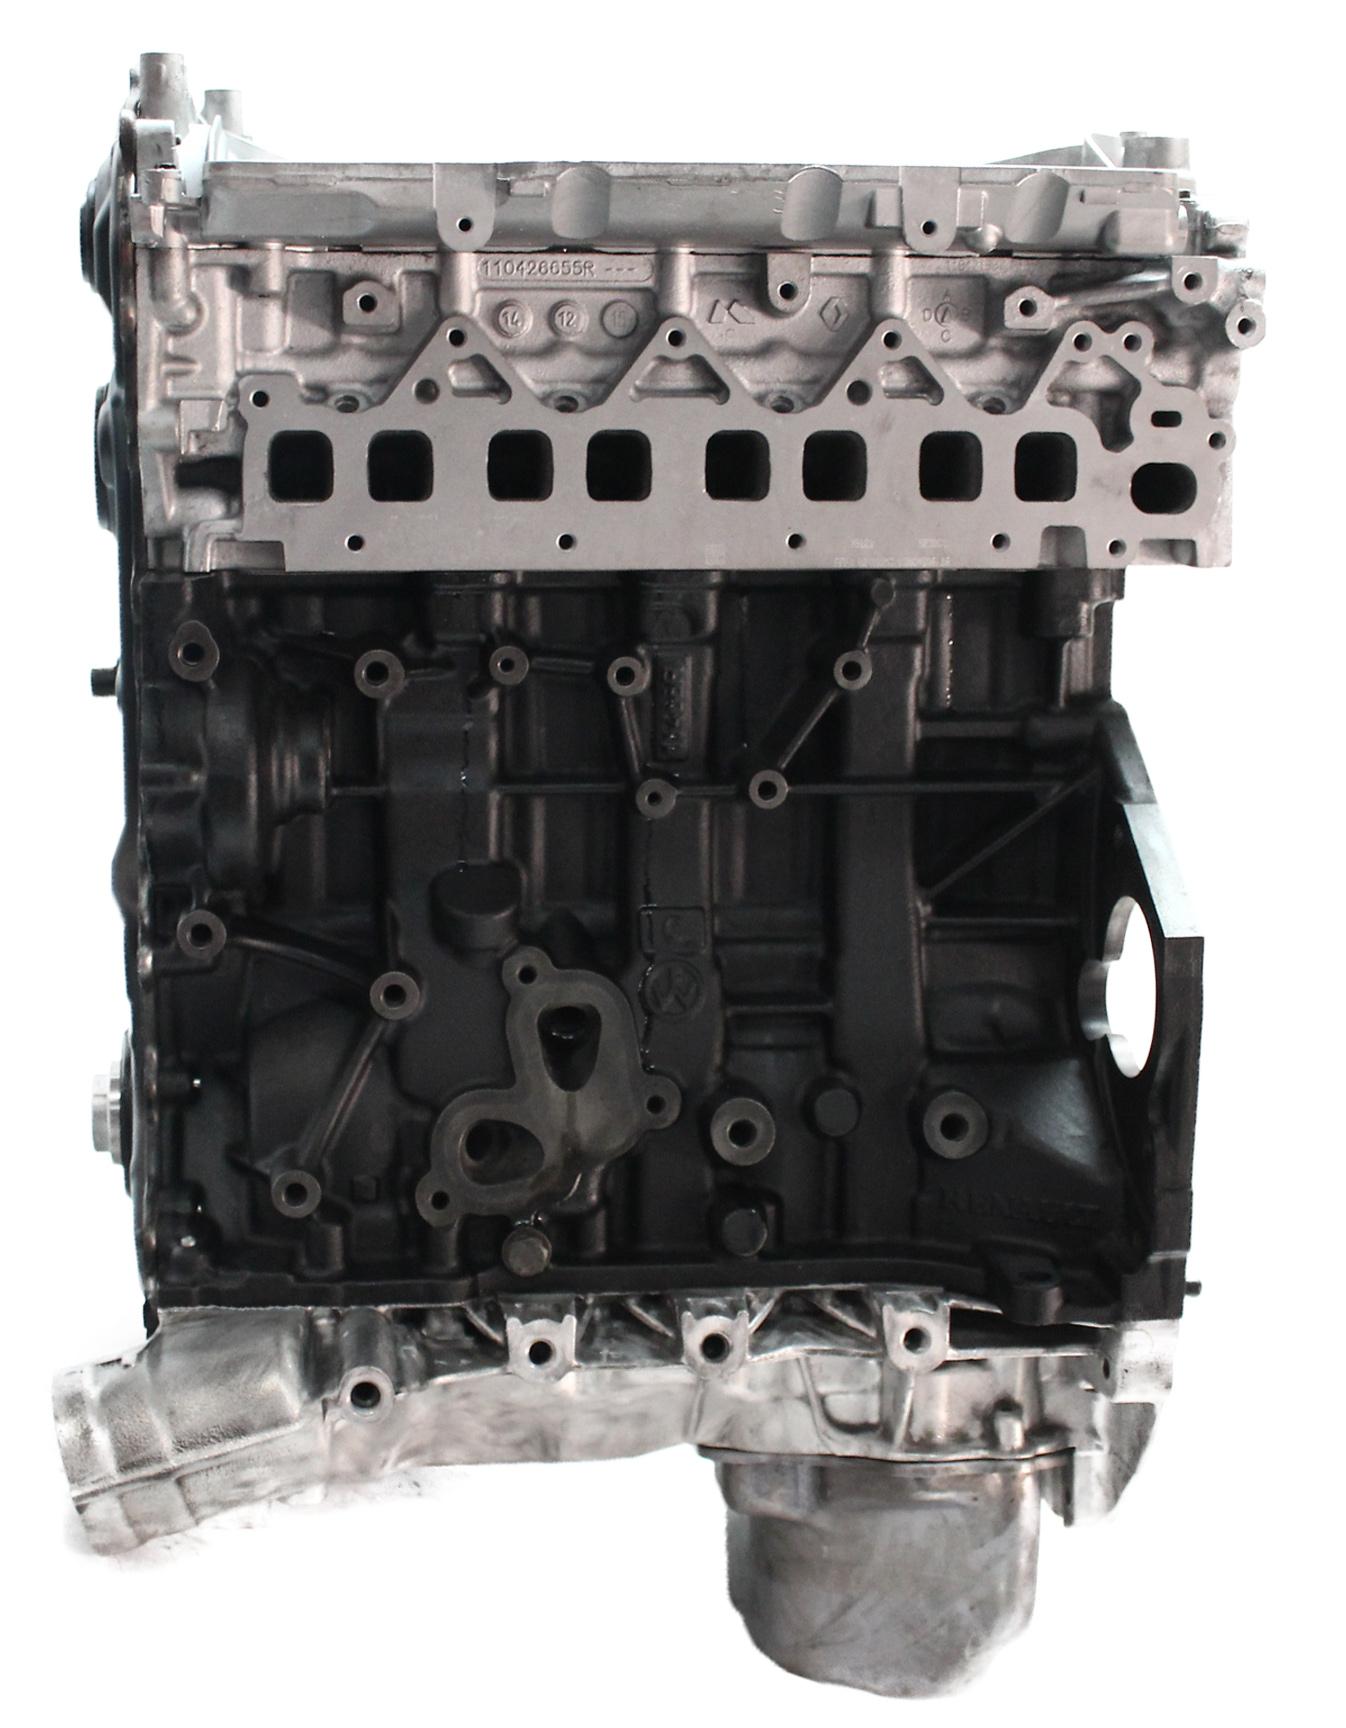 Motor 2017 für Nissan Mercedes Benz Navara X-Klasse 2,3 D YS23DDT YS23A260 699.300